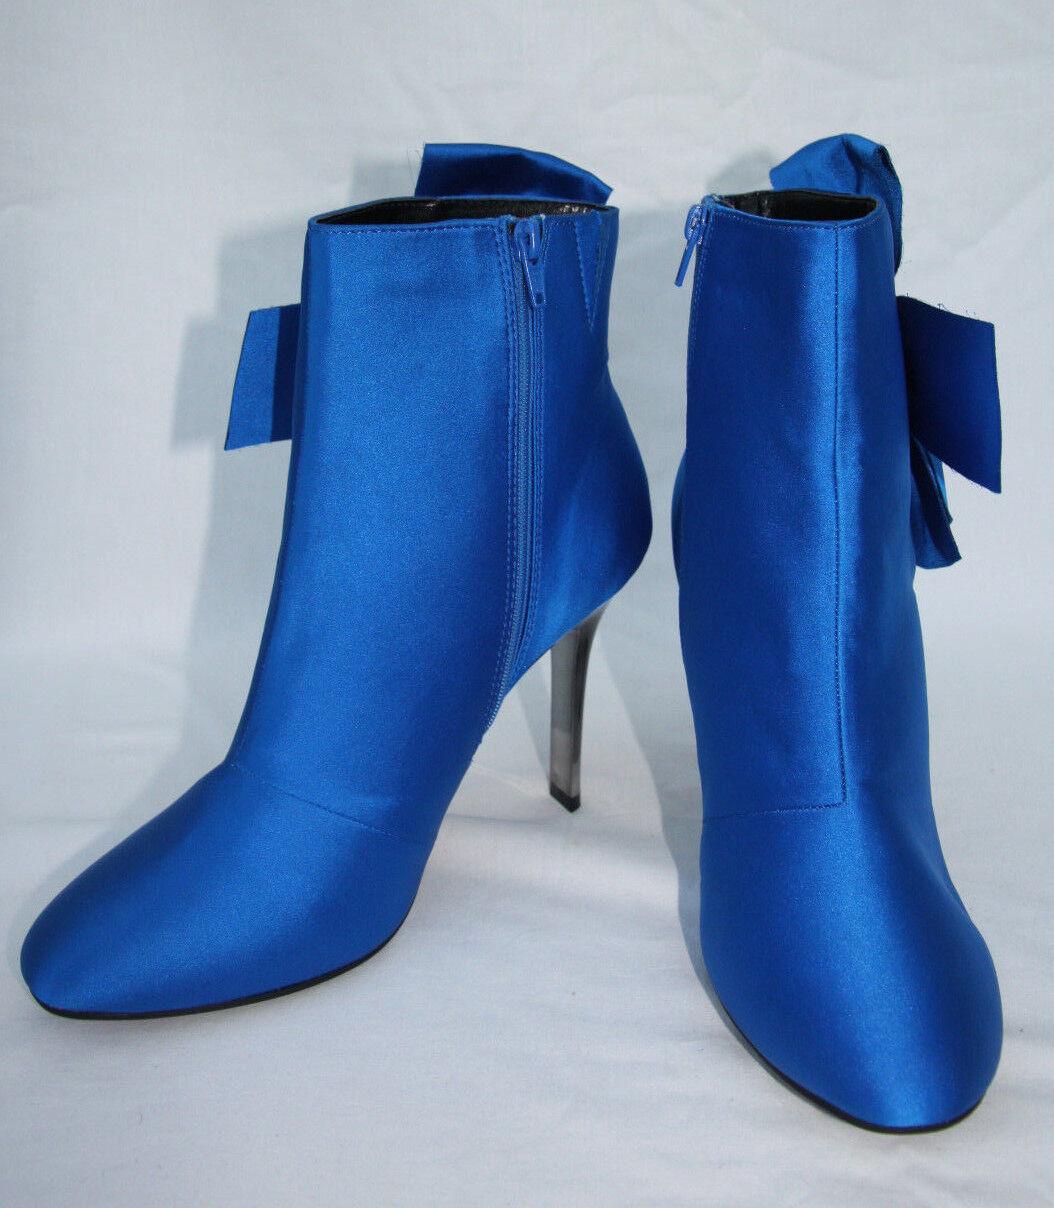 Marks & Spencer UK Size 7.5 Eur 41 bluee Stiletto Heel Ankle Boots